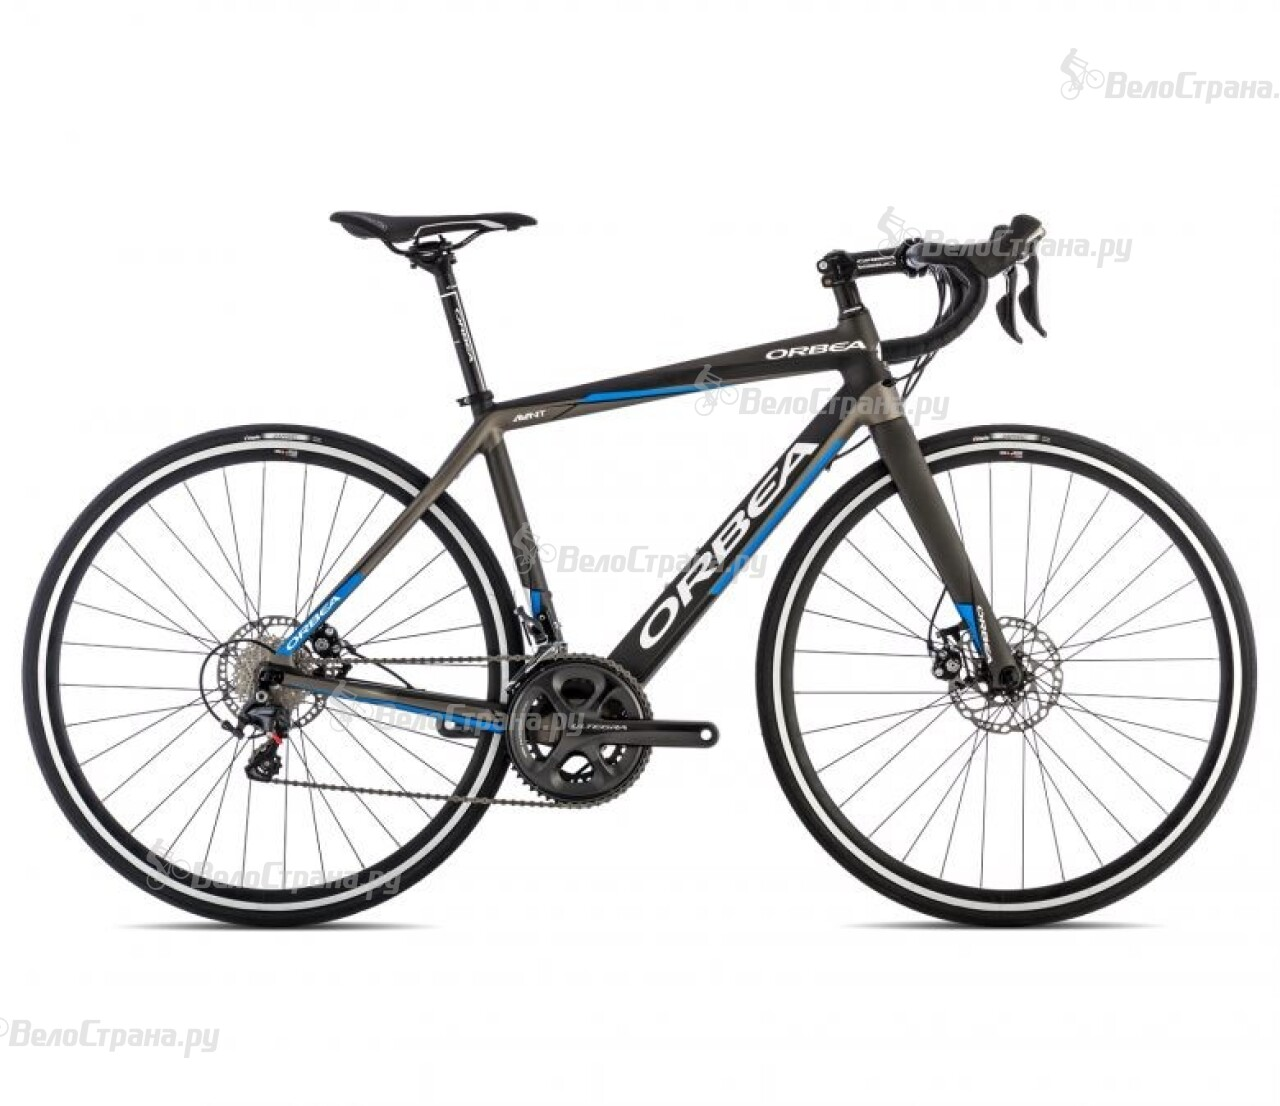 цены Велосипед Orbea Avant M30d (2014)